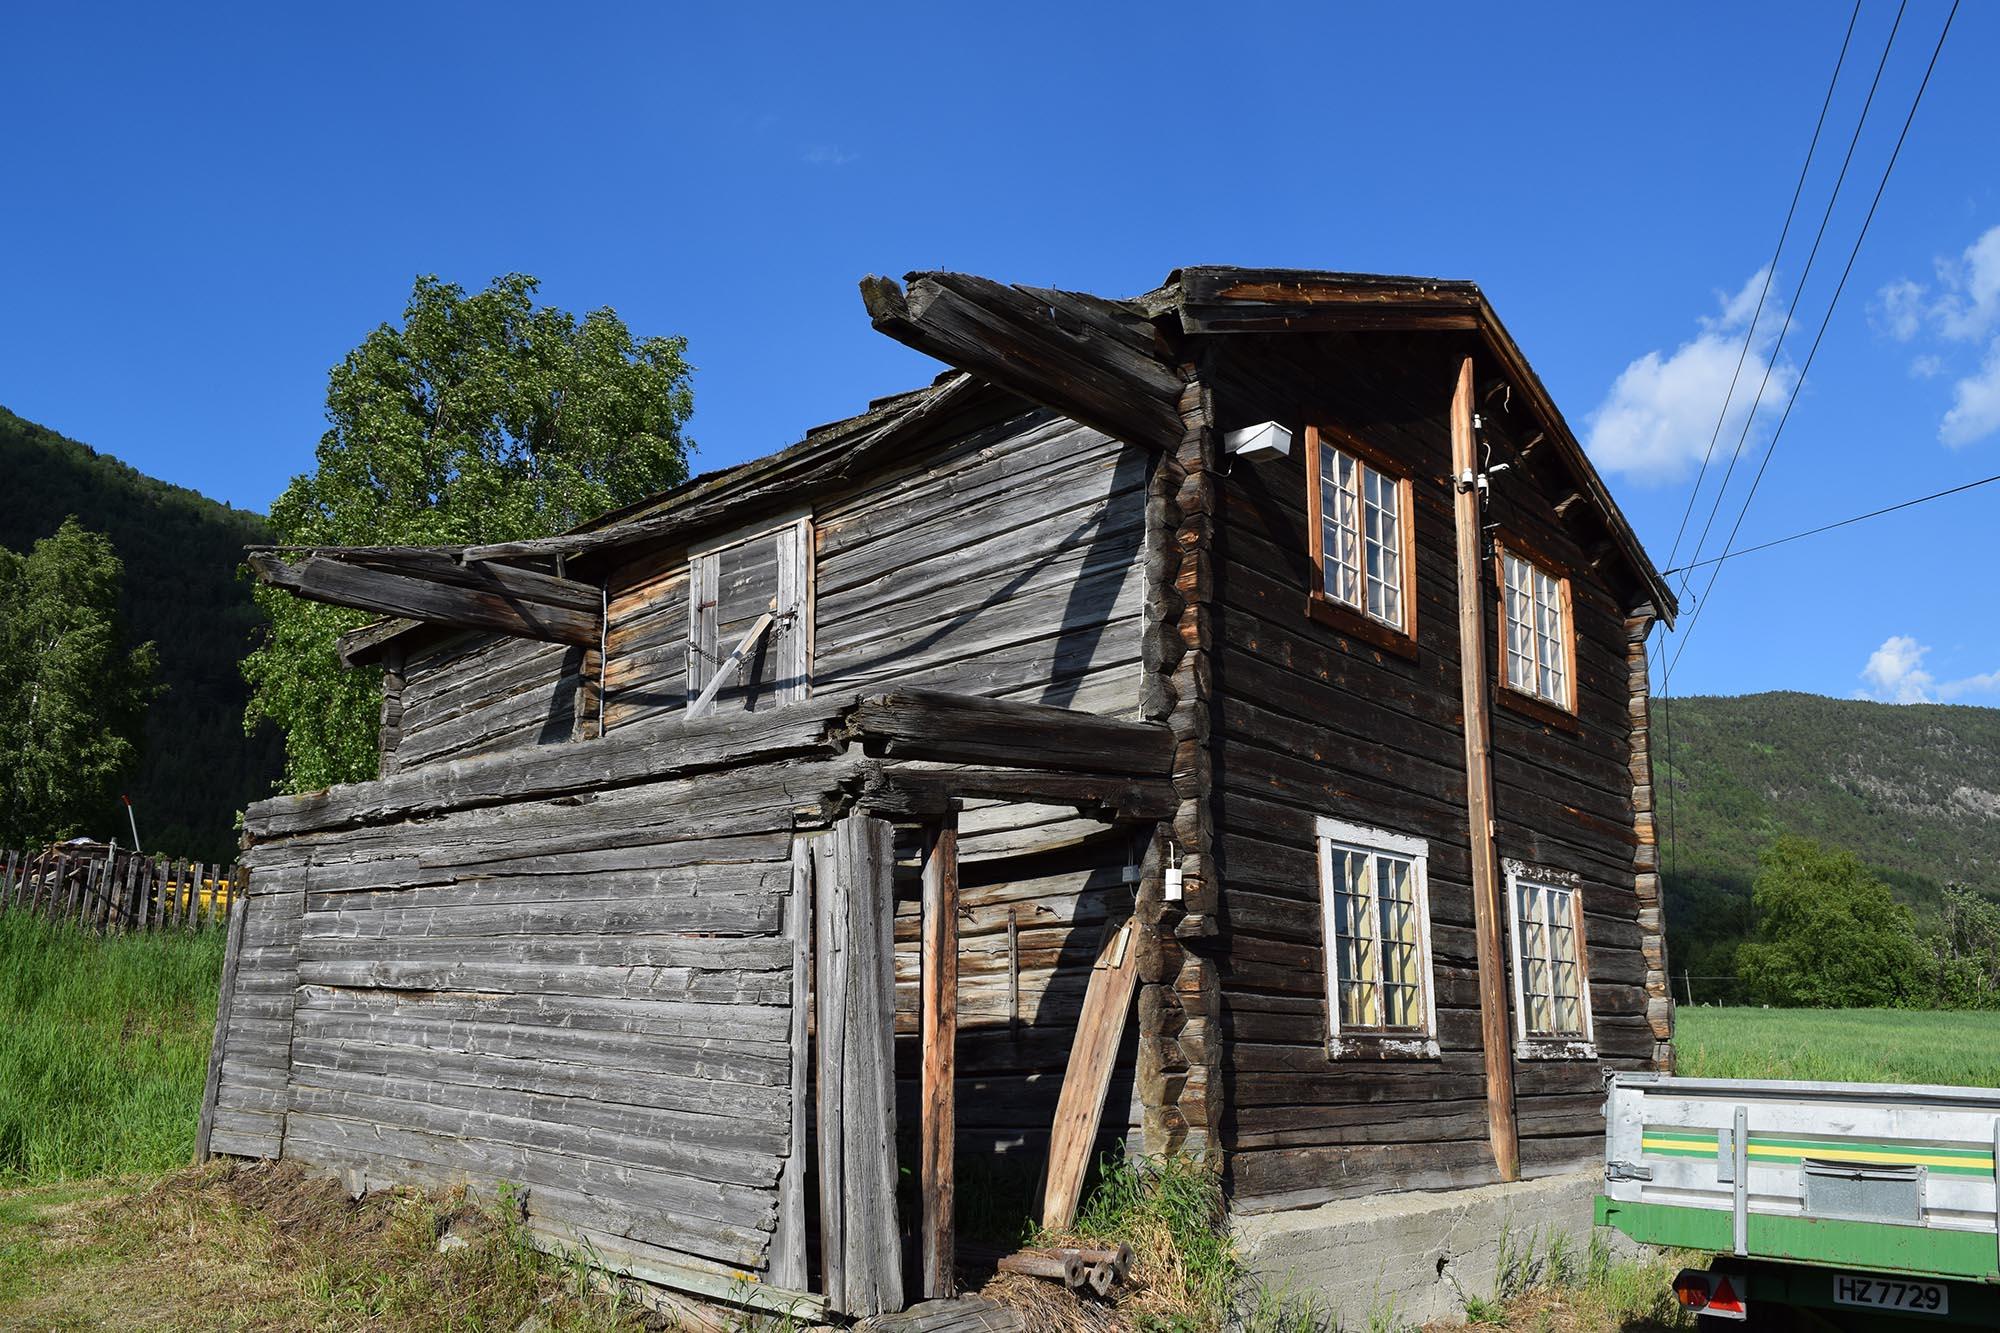 Våningshuset på Kolstad før det ble satt i stand. (Foto: Einar Engen/Kulturminnefondet)